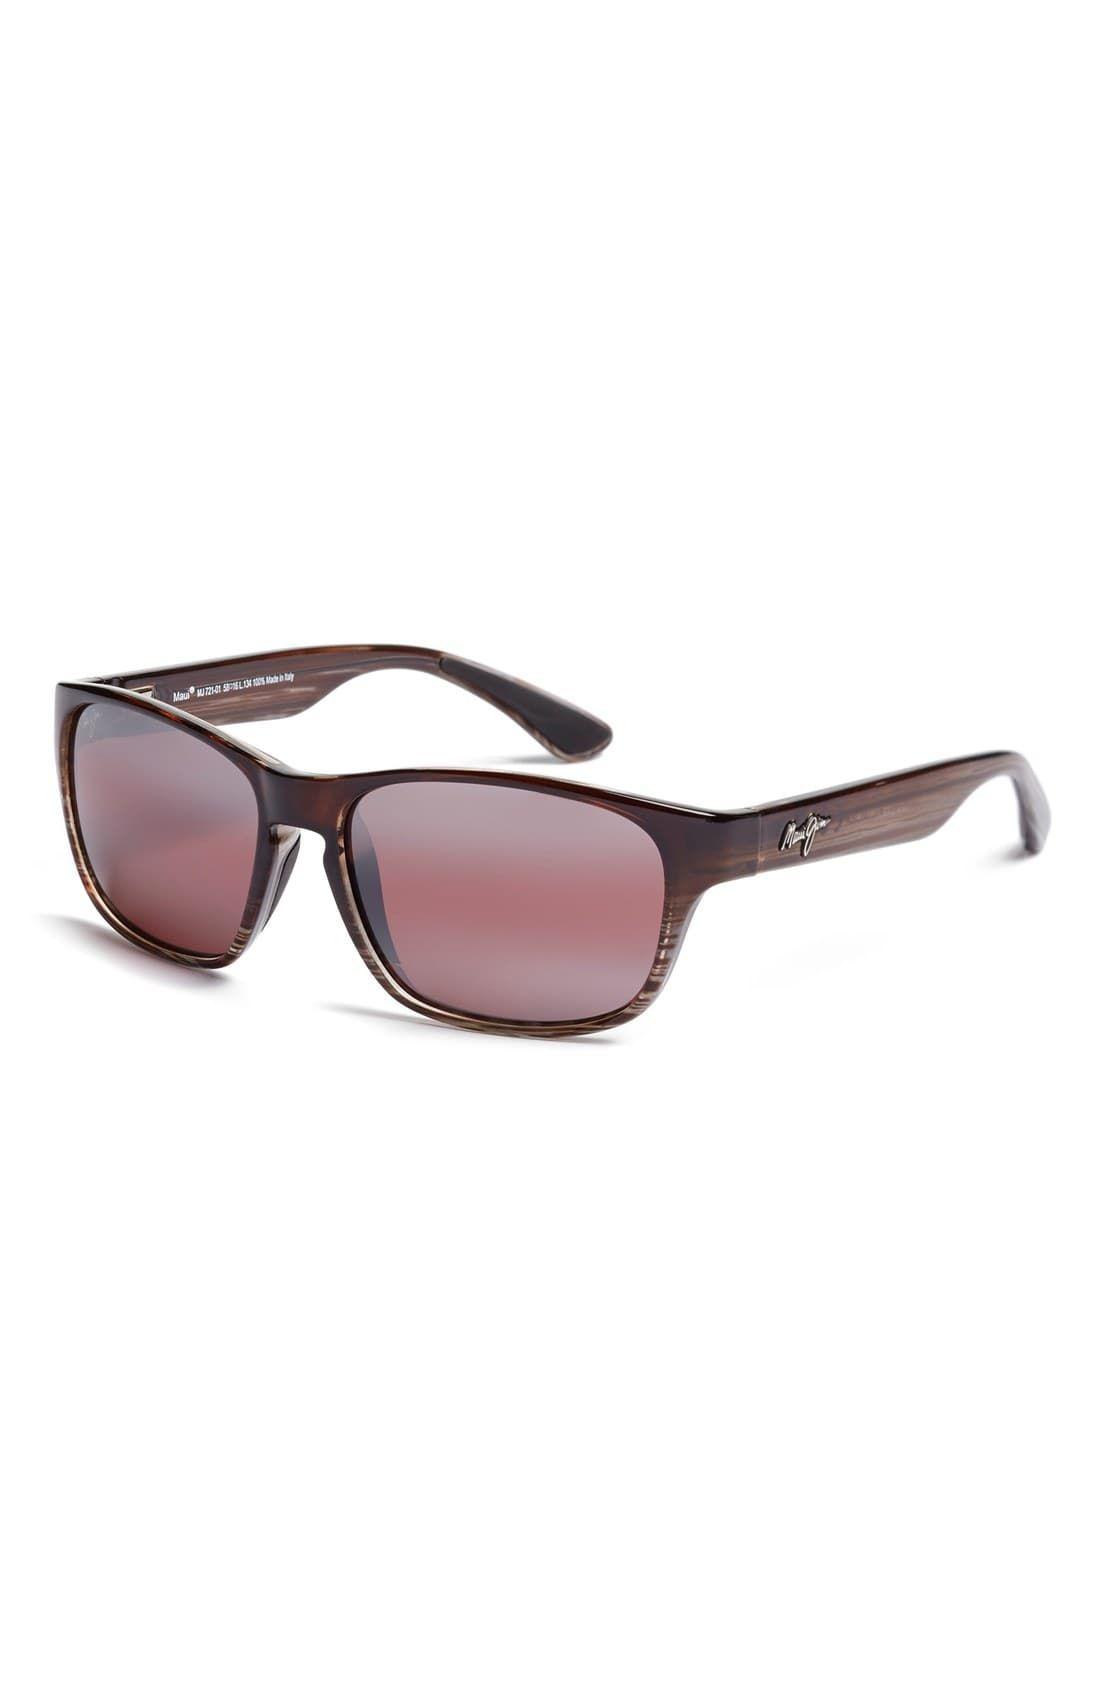 885c65d6627 Men's Maui Jim 'Mixed Plate - Polarizedplus2' 58Mm Sunglasses - Chocolate  Stripe/ Maui Rose